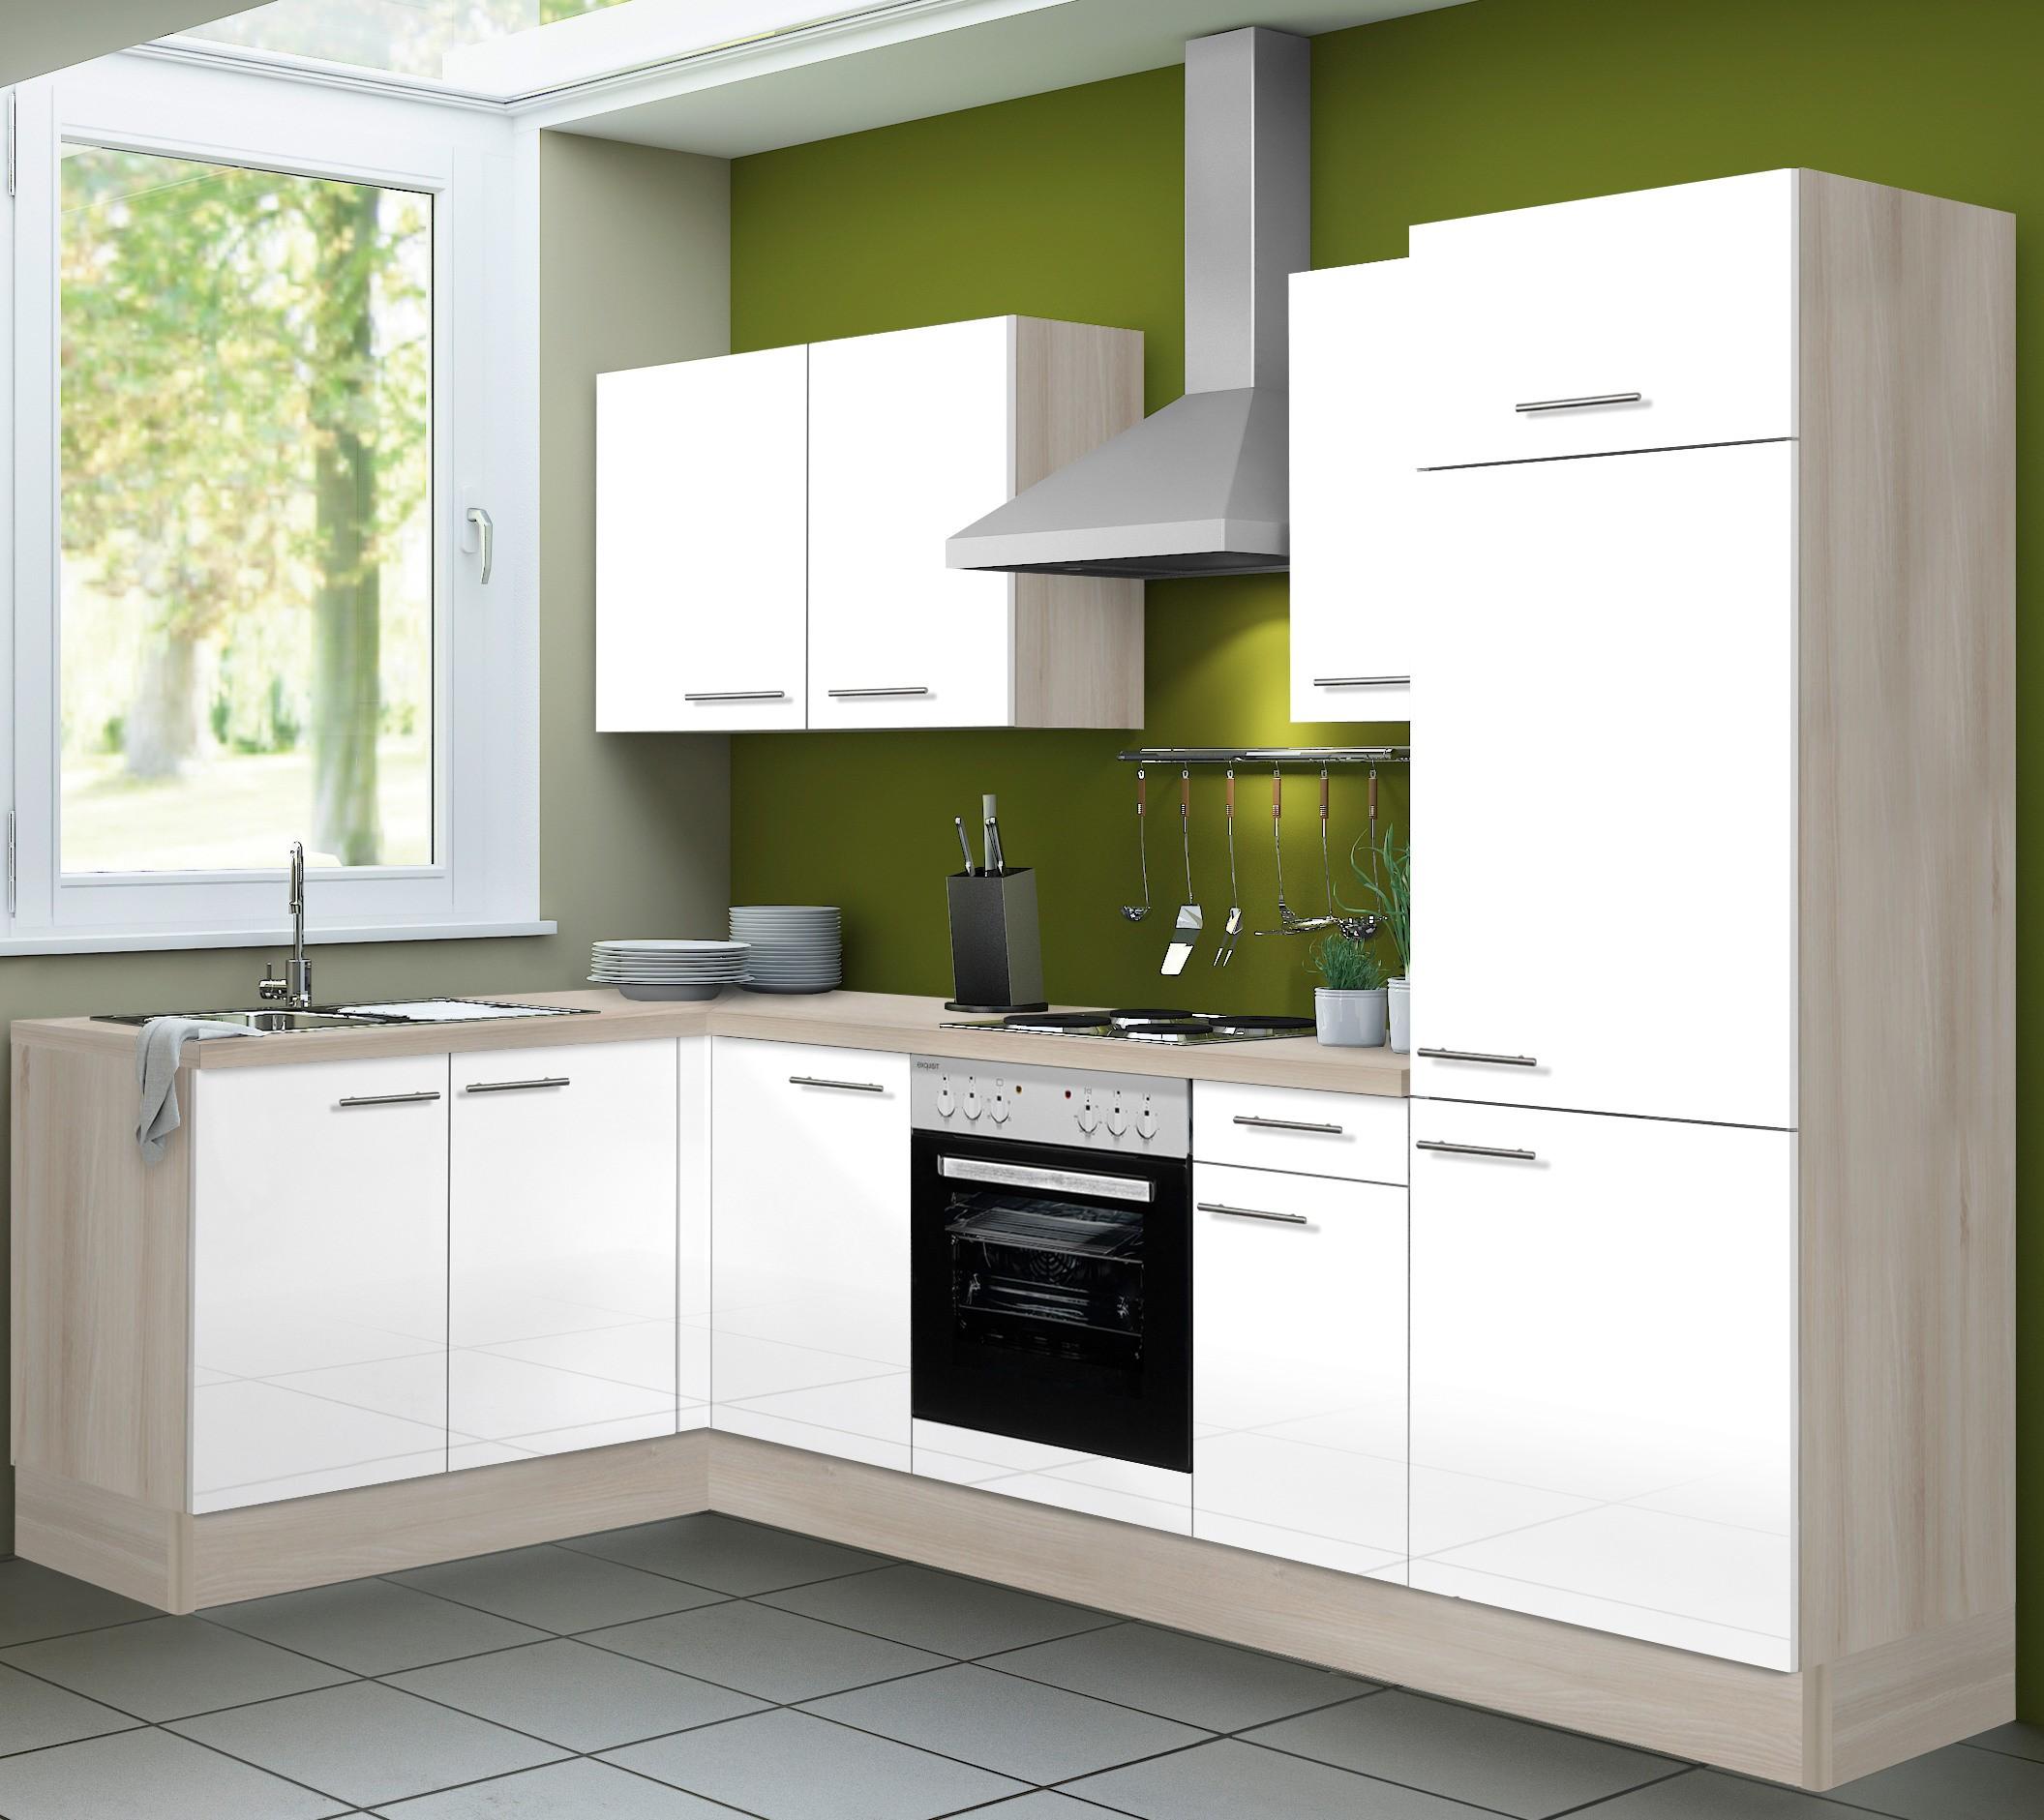 eckk che leon vario 1 k che mit e ger ten breite 270. Black Bedroom Furniture Sets. Home Design Ideas